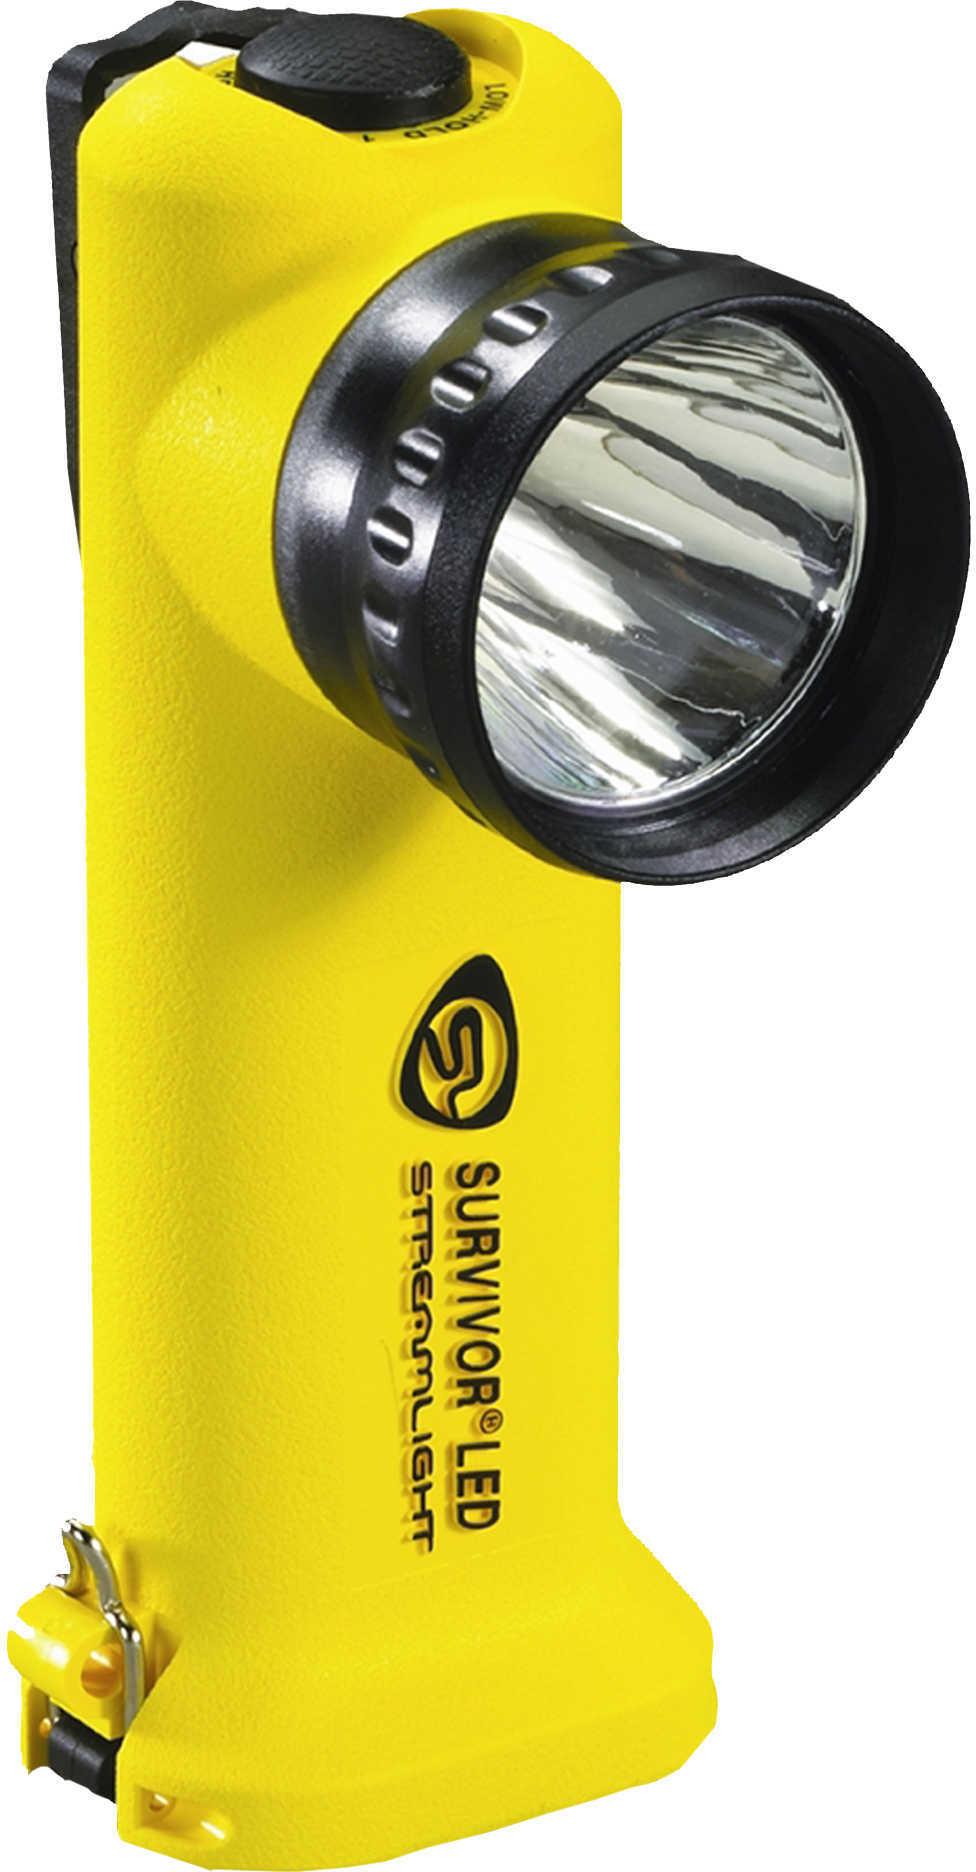 Streamlight Survivor Led Flashlight, Yellow, Battery Powered Md: 90541